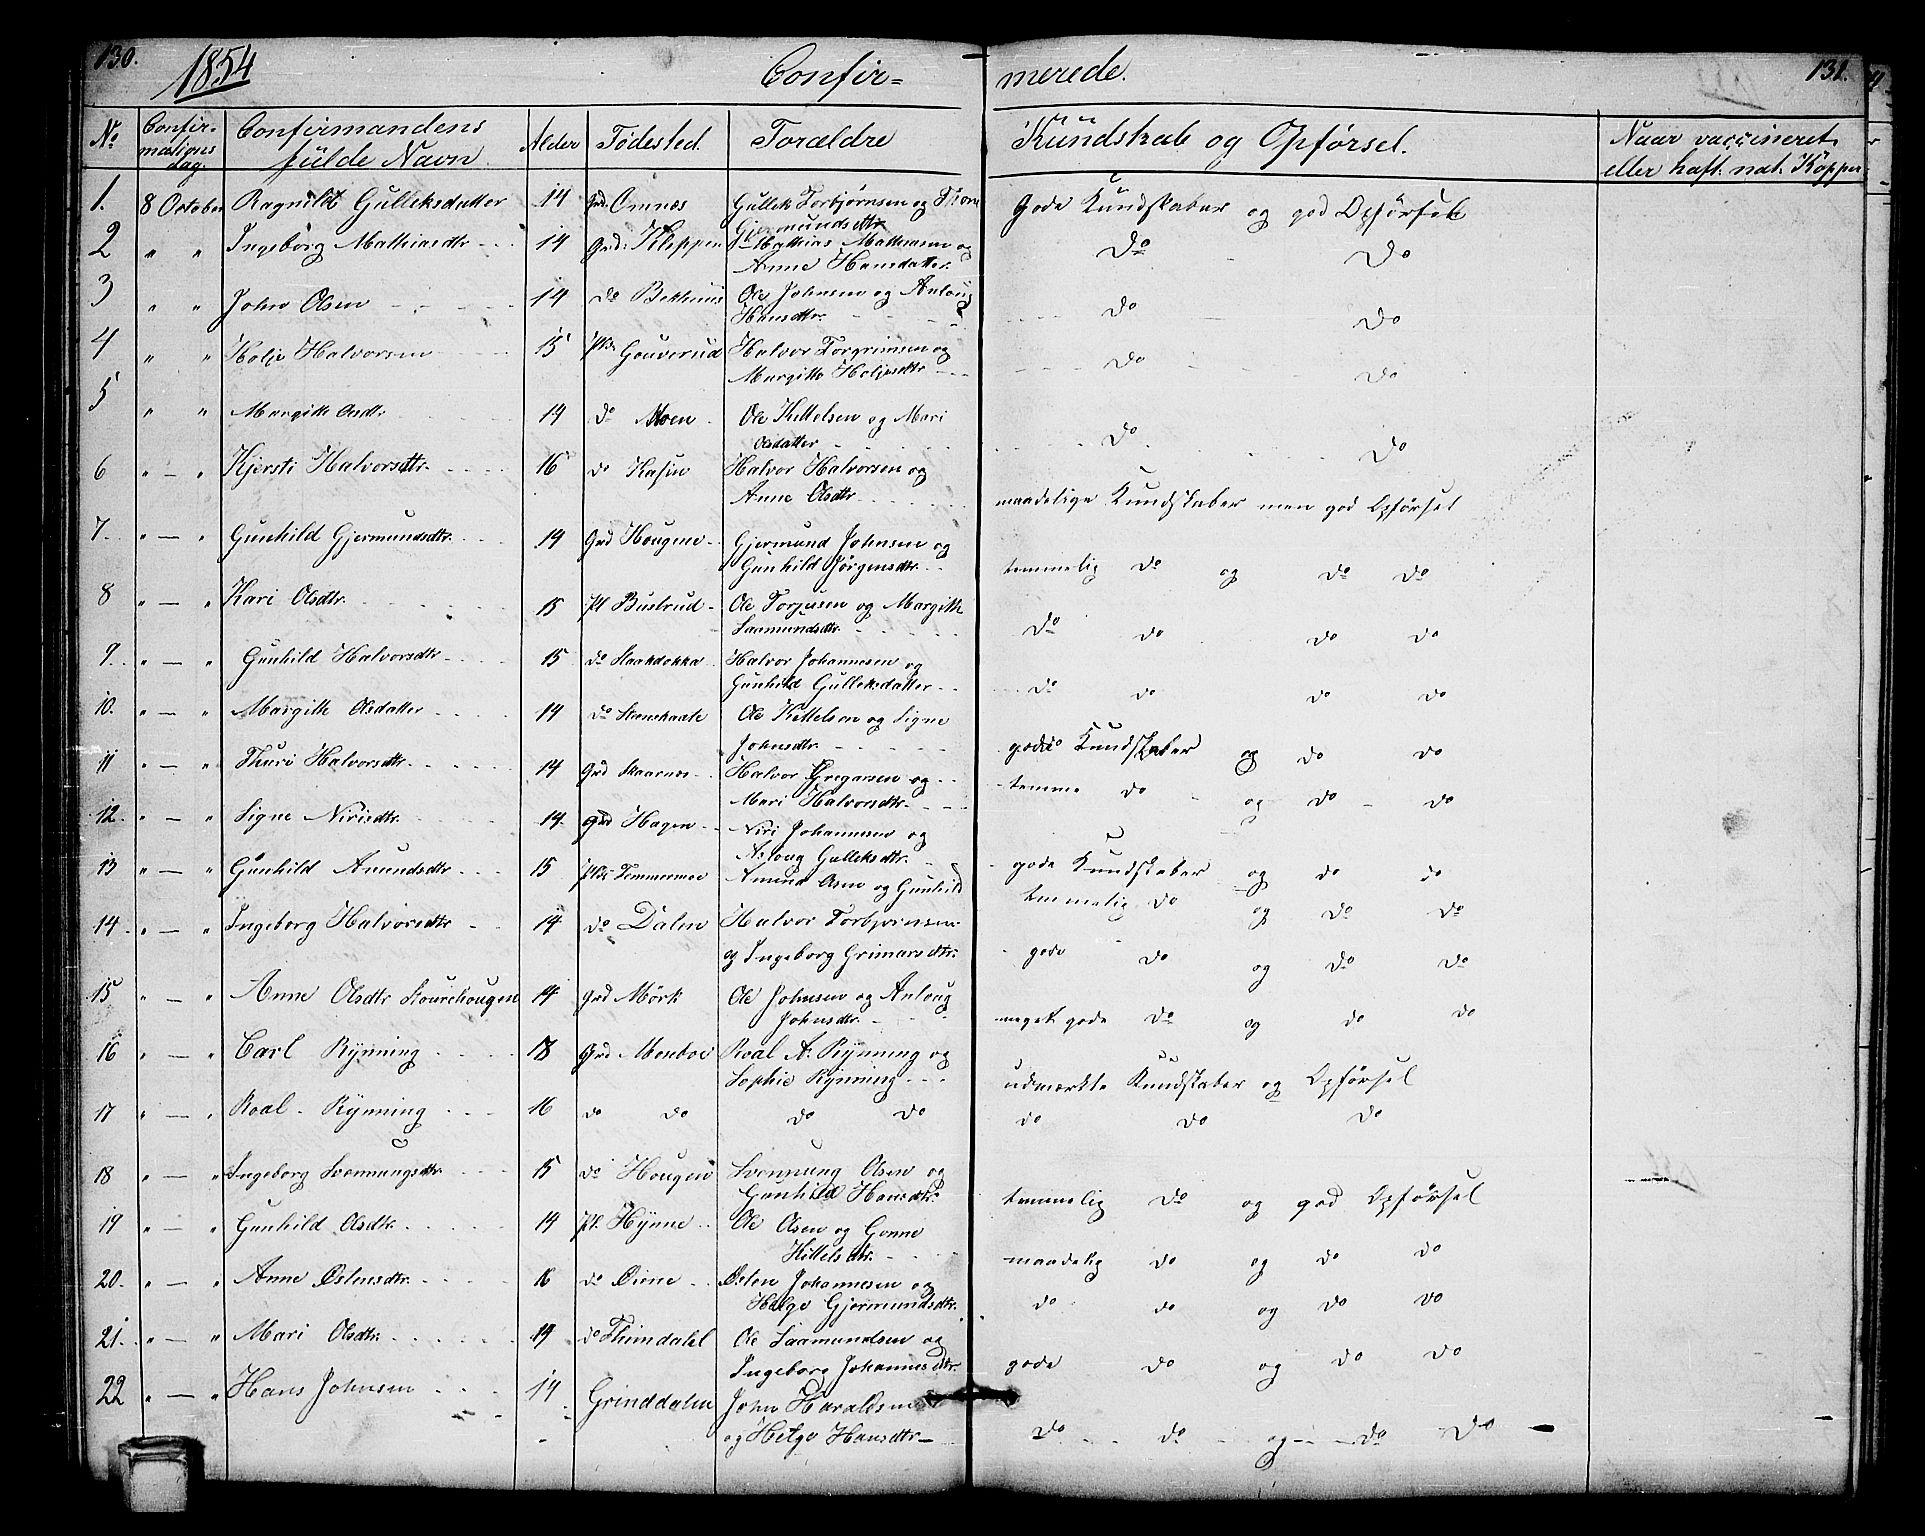 SAKO, Hjartdal kirkebøker, G/Gb/L0002: Klokkerbok nr. II 2, 1854-1884, s. 130-131